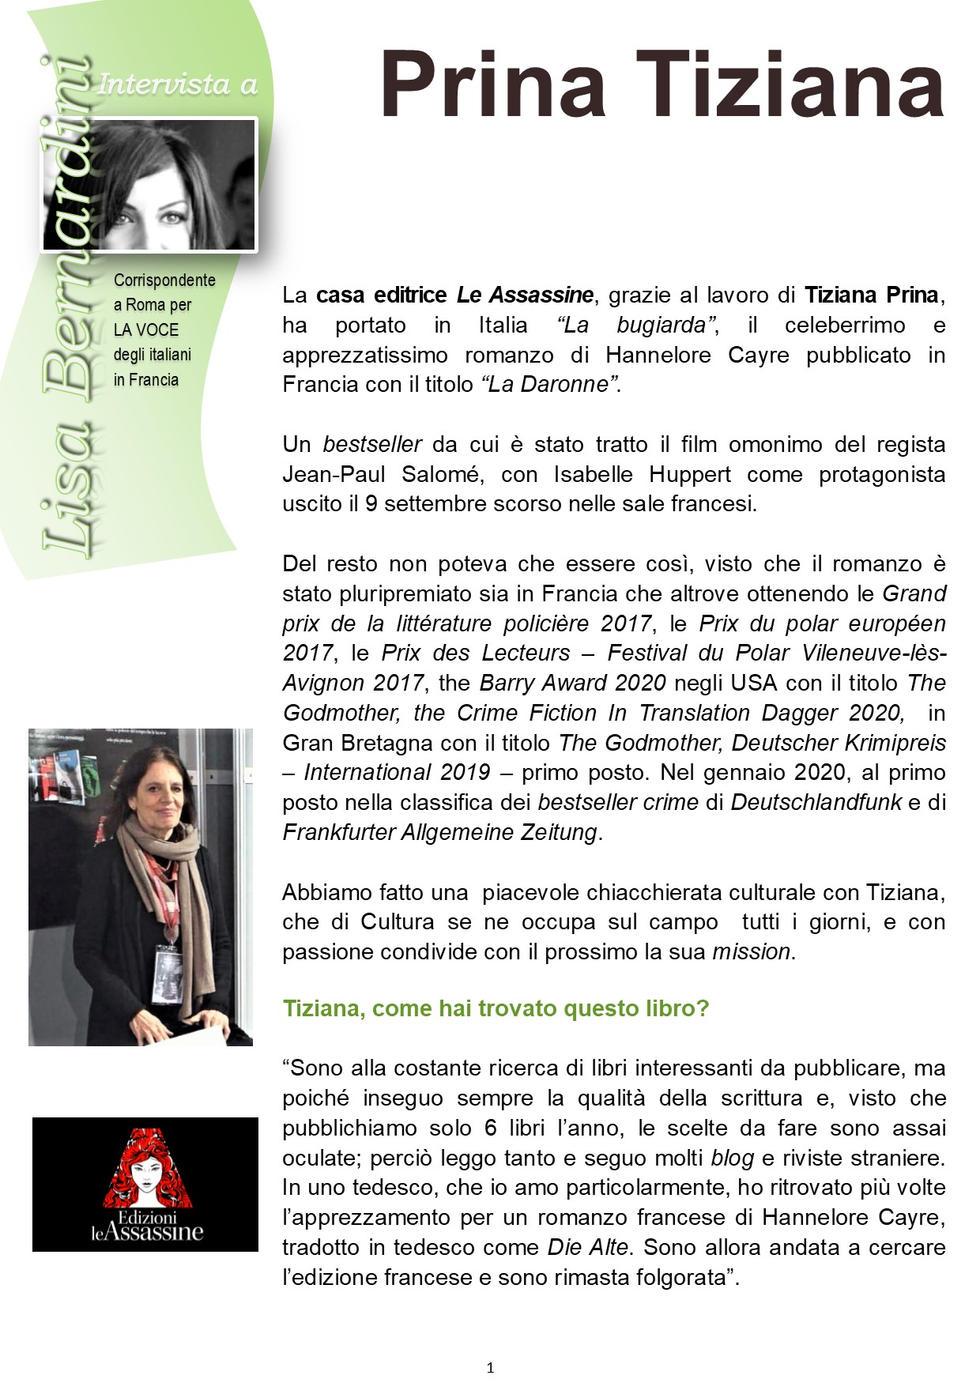 art PRINA 1 Tizianai 14052021.jpg